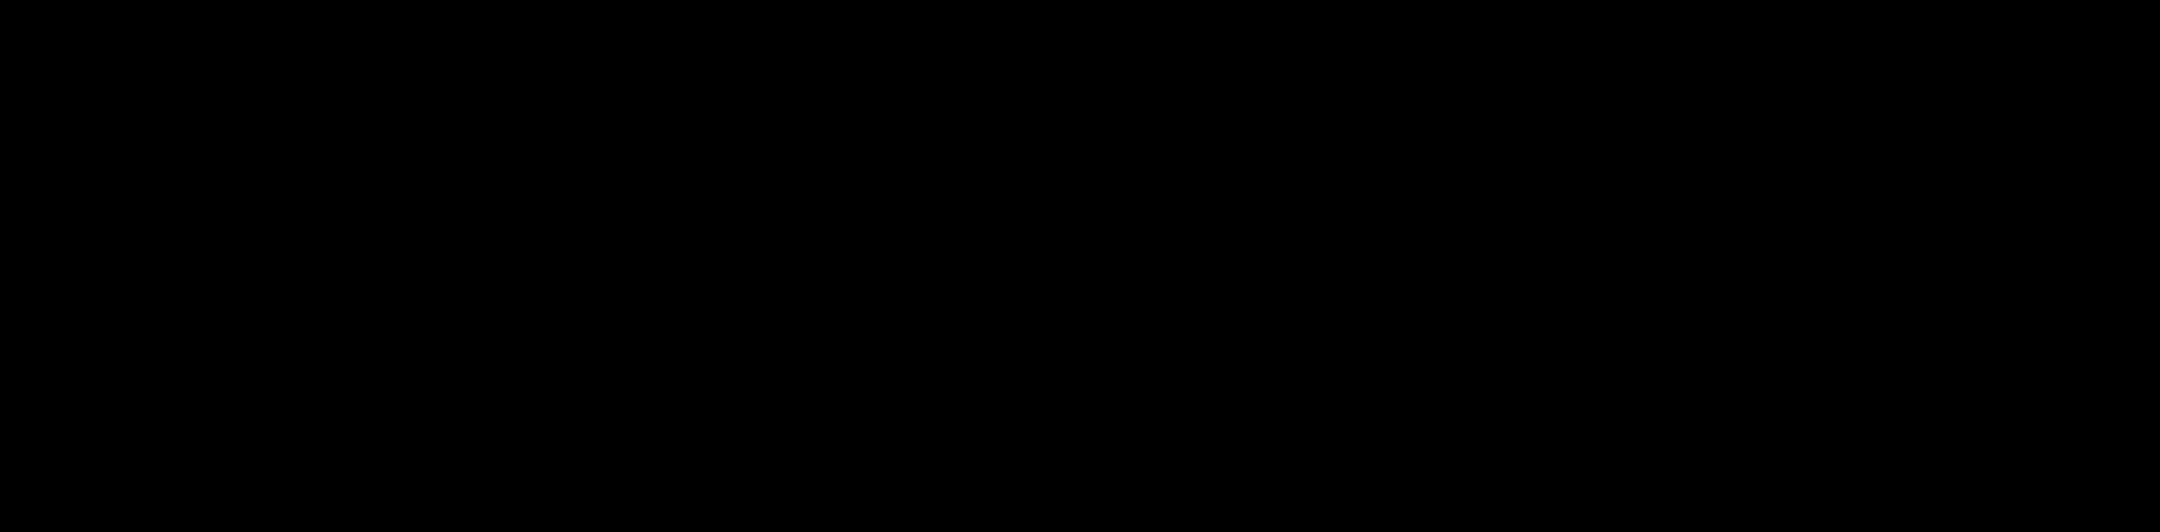 starz logo 1 - STARZ Logo